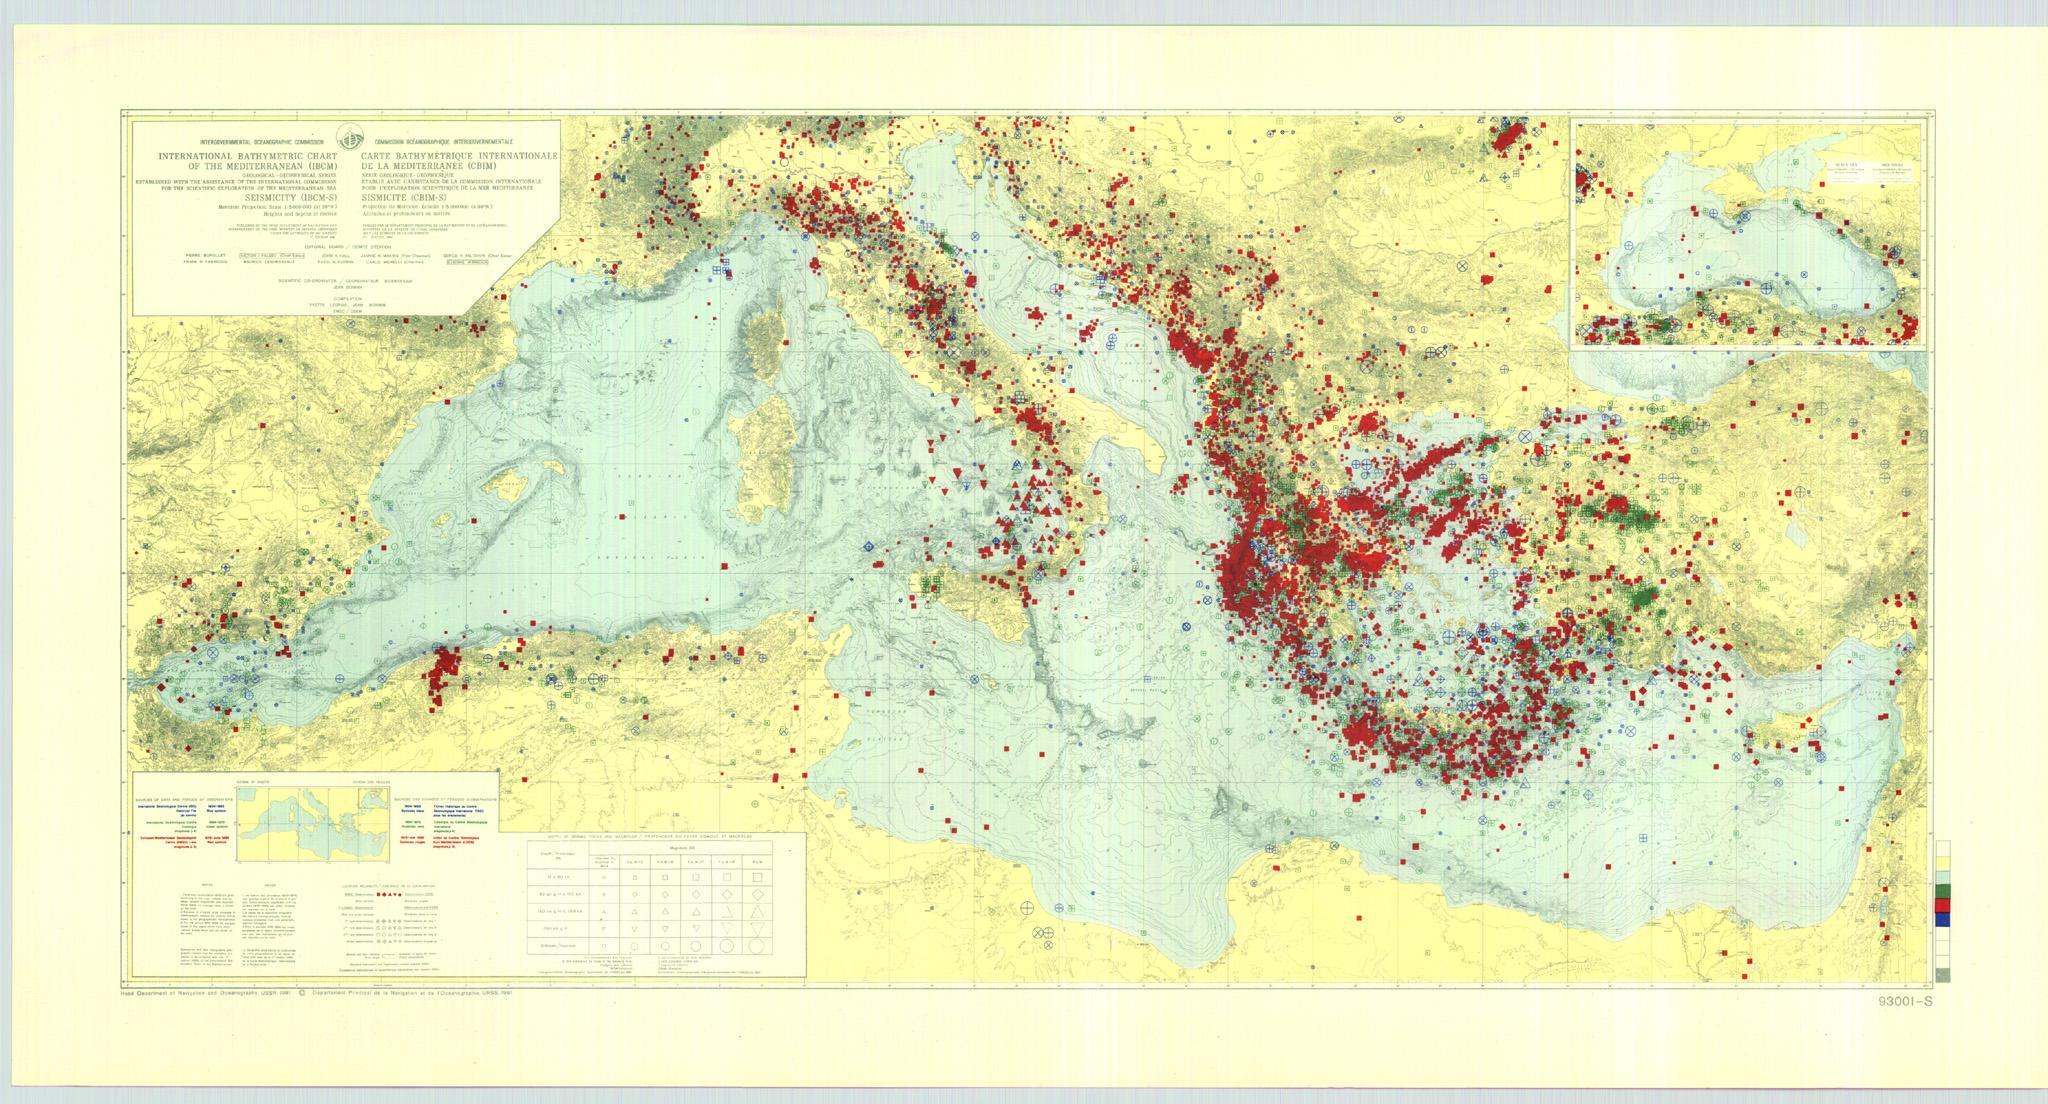 IOC IHO IBCM-International Bathymetric Chart of the Mediterranean   NCEI